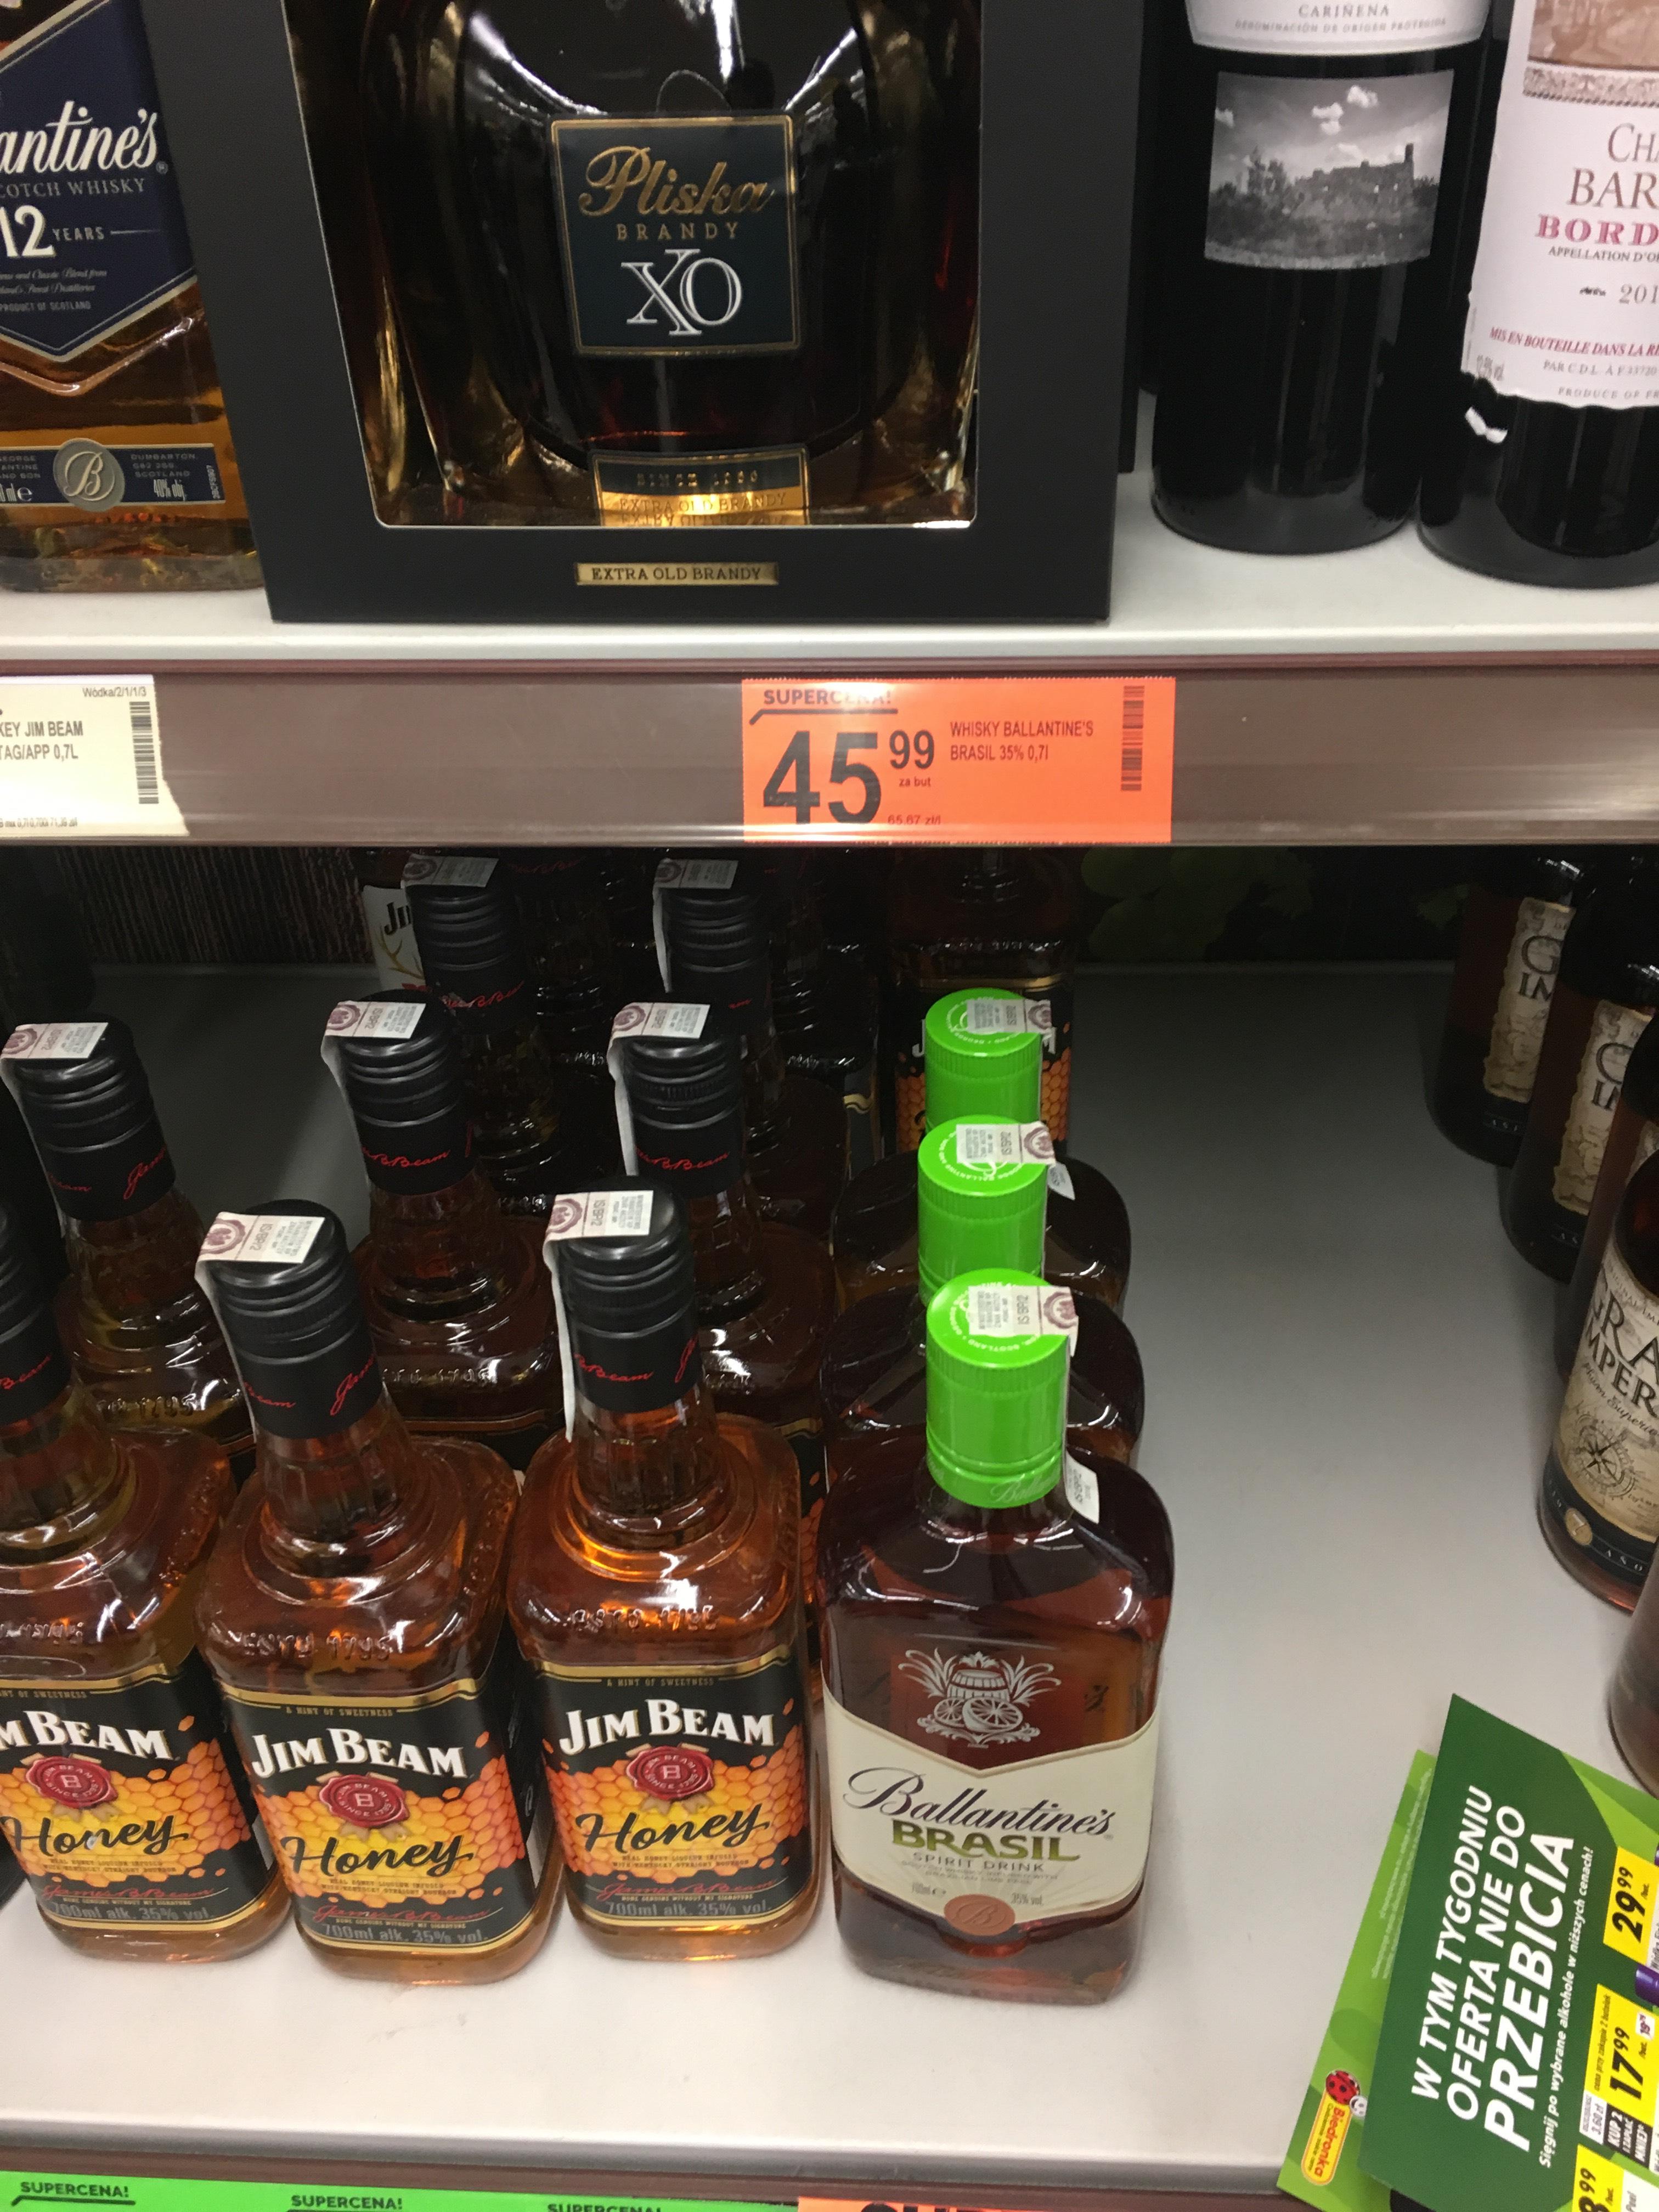 Ballantine's Brasil 0.7 spirit drink